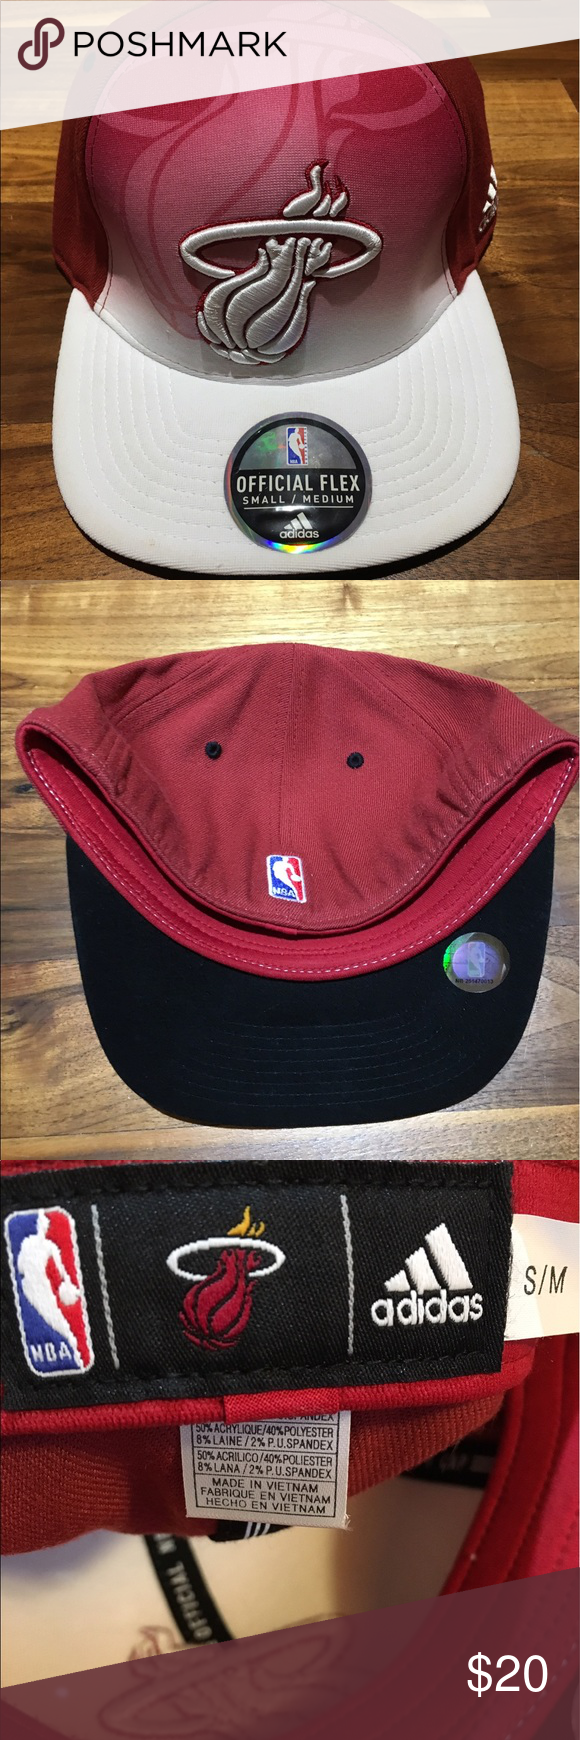 dd8ef634 Miami Heat Adidas NBA Draft Hat Miami Heat Mens Adidas ClimaLite NBA Draft  Baseball Hat. Brand New. Size Small/Medium. Flexfit. Adidas Accessories Hats